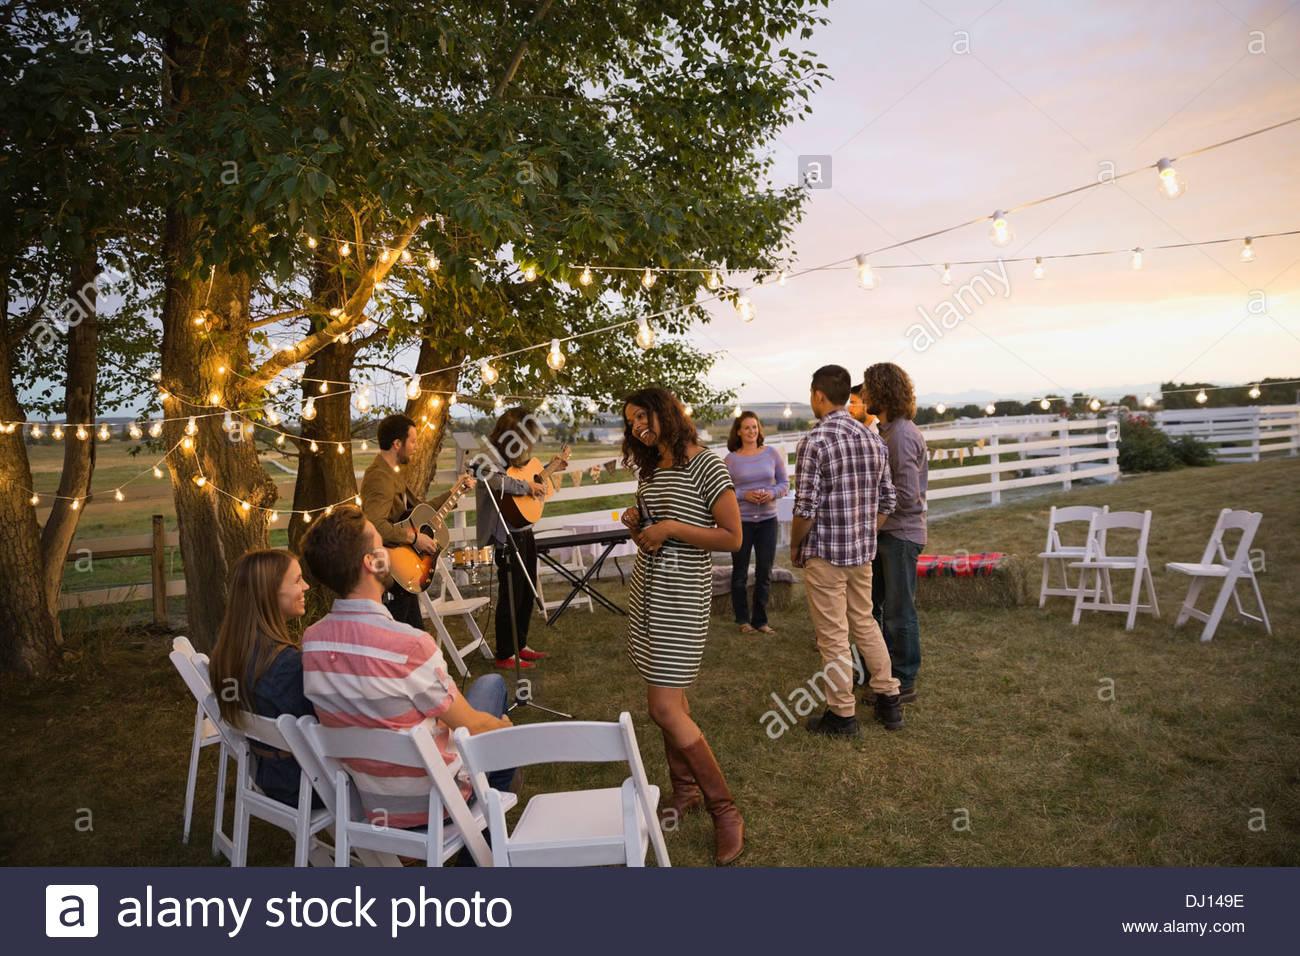 Friends enjoying outdoor farm party - Stock Image